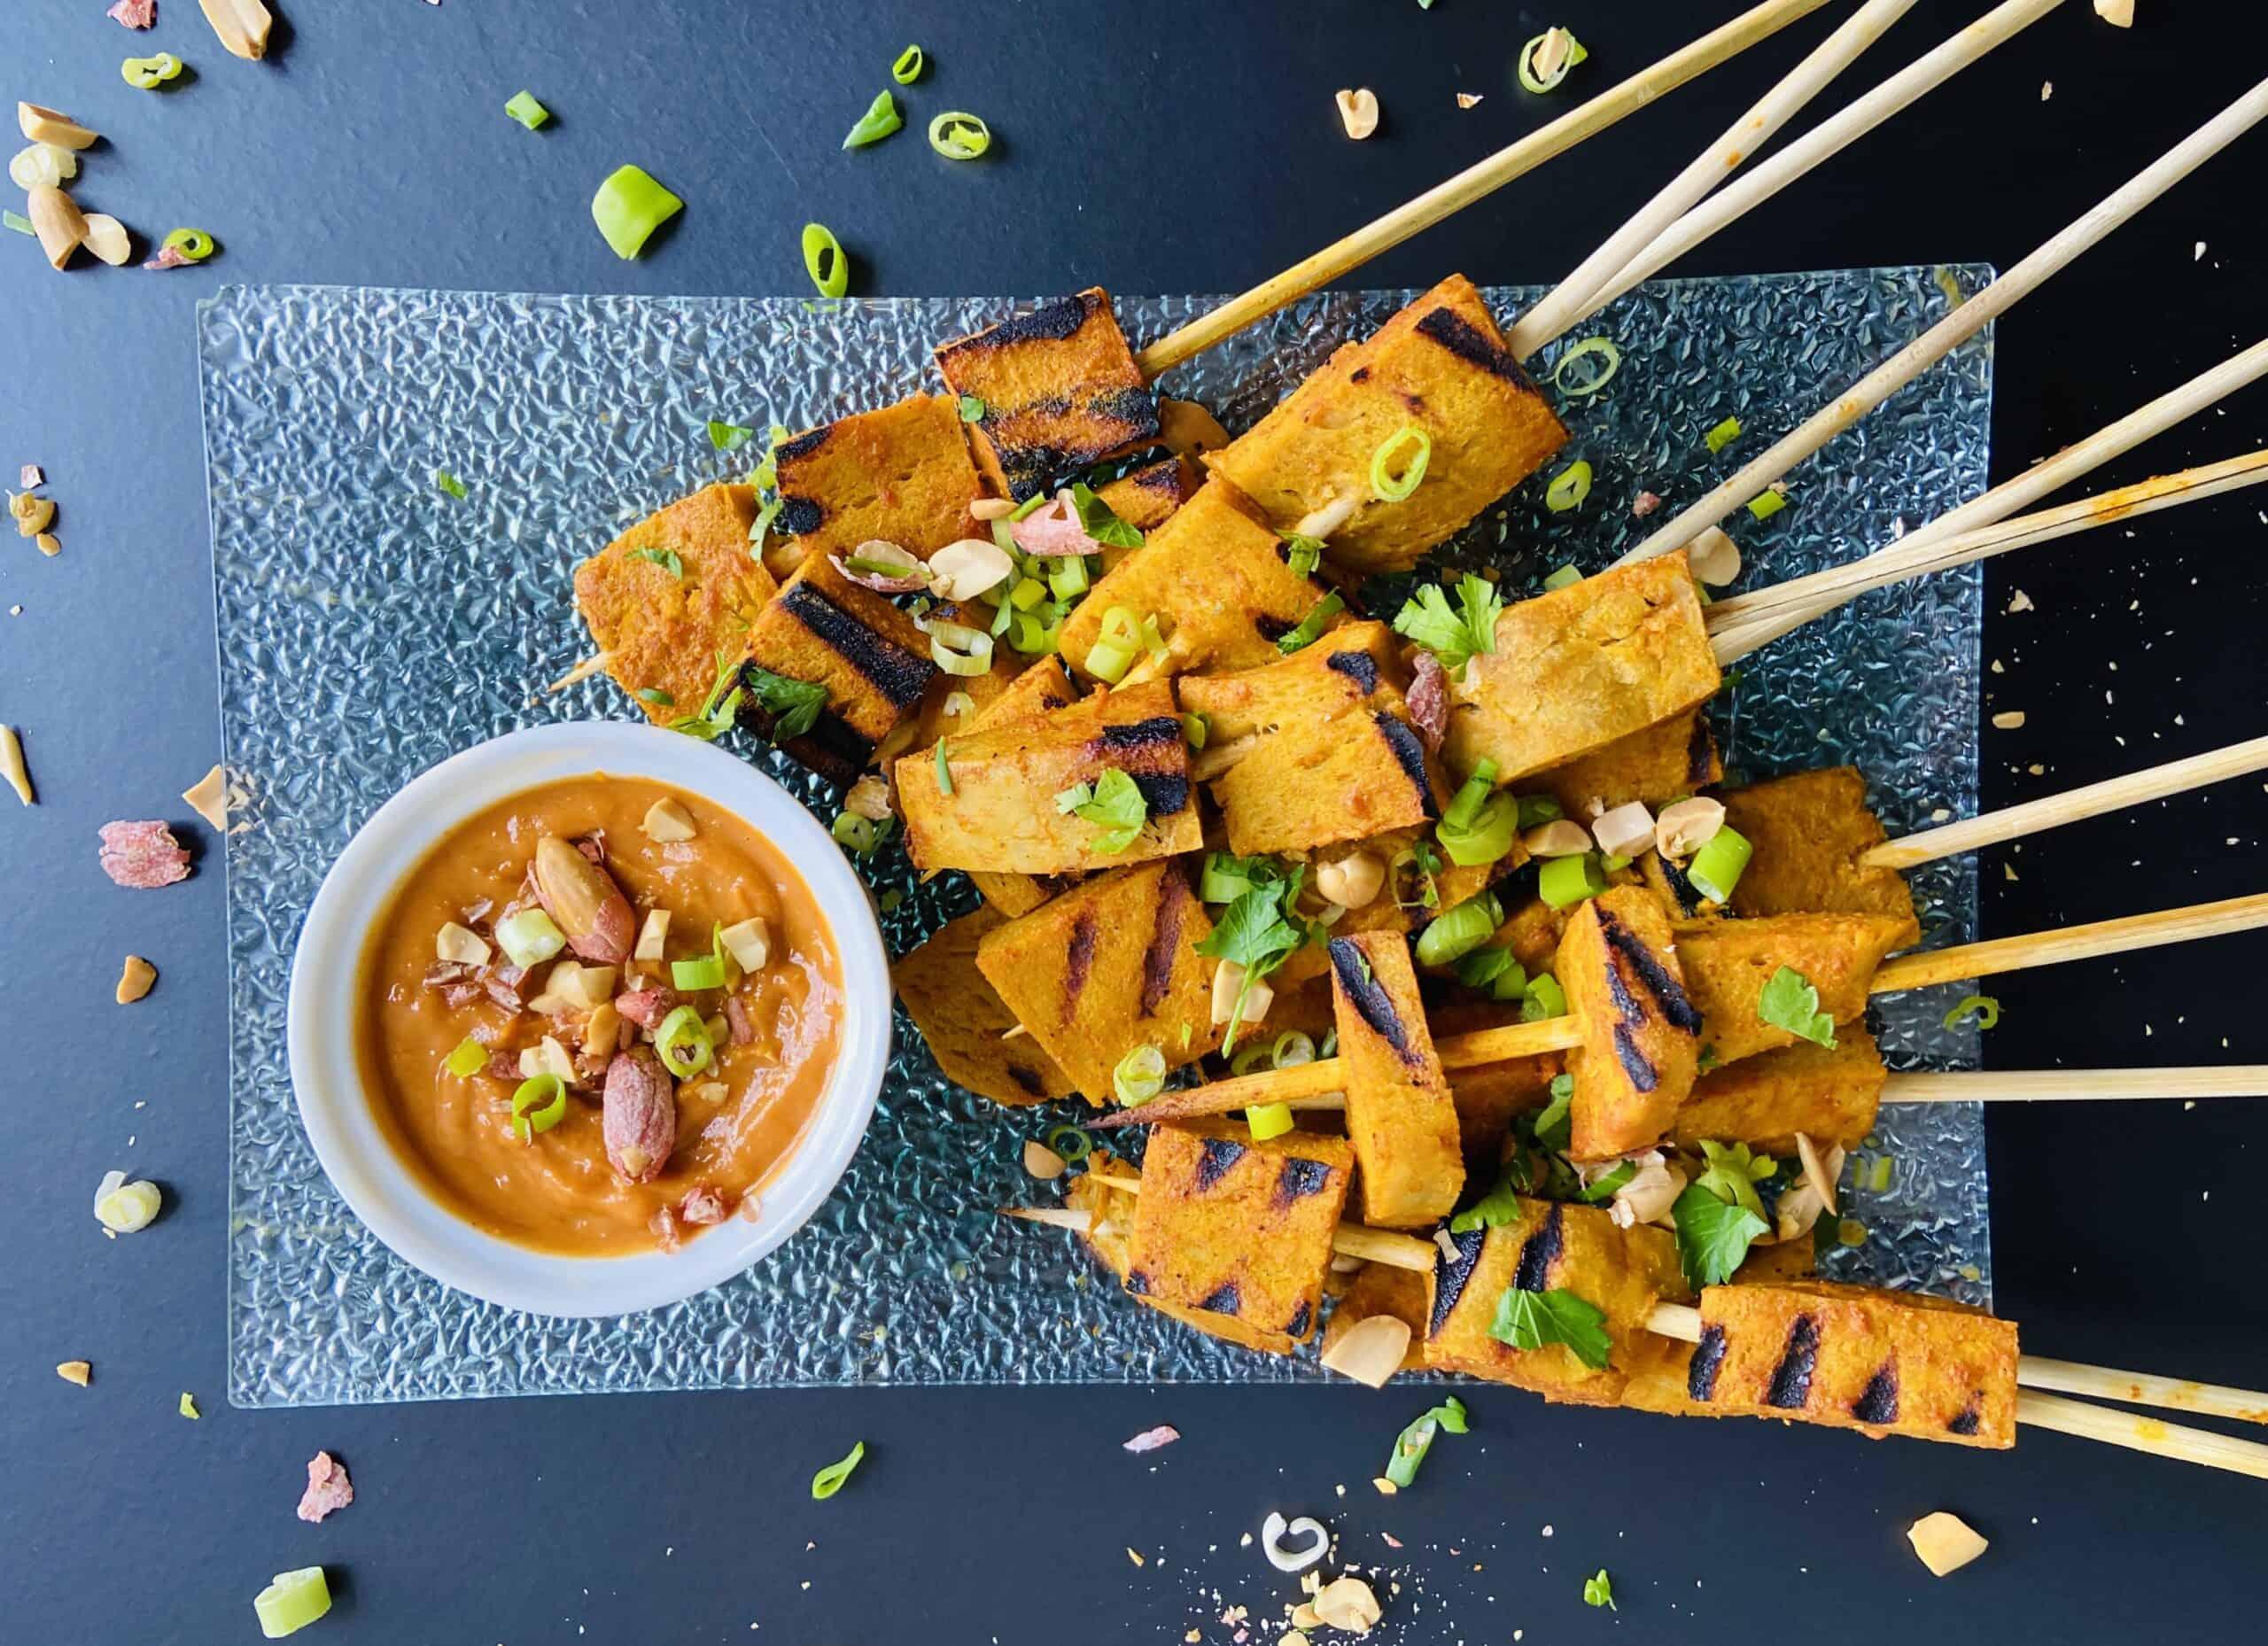 Seitan Satay – Vegan Satay Skewers with Peanut Sauce